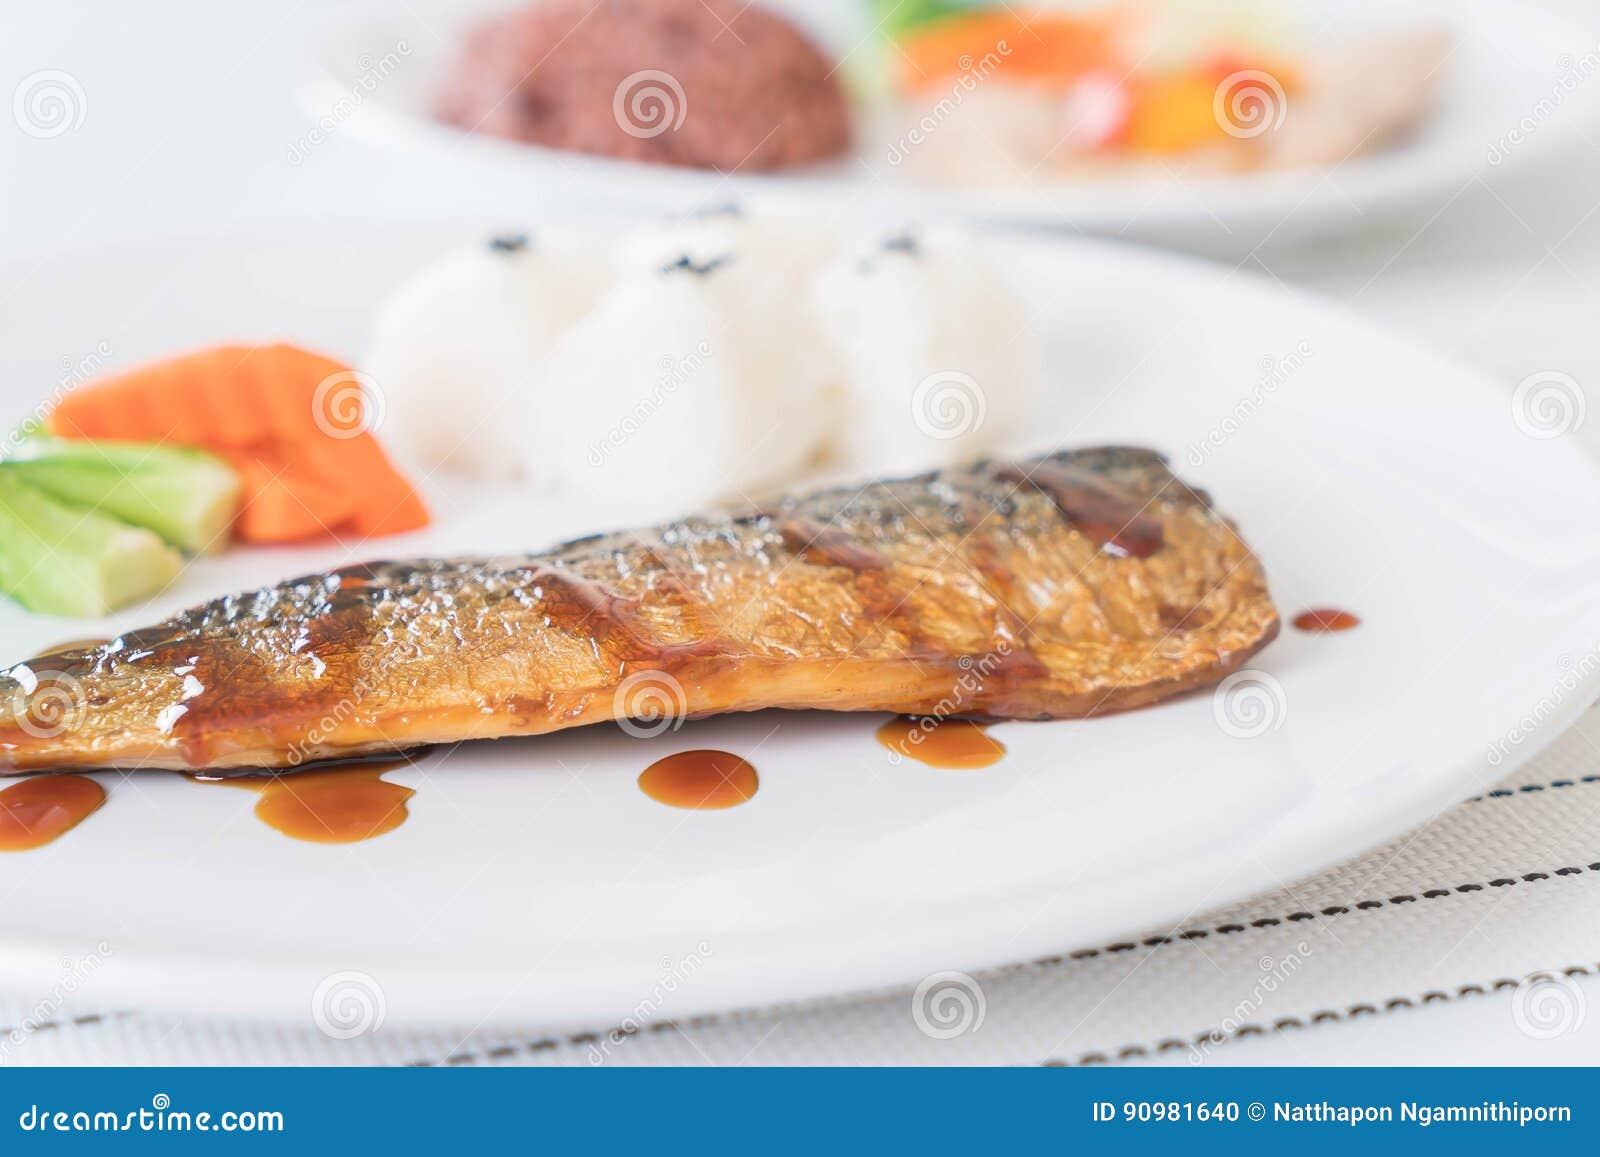 how to cook saba fish